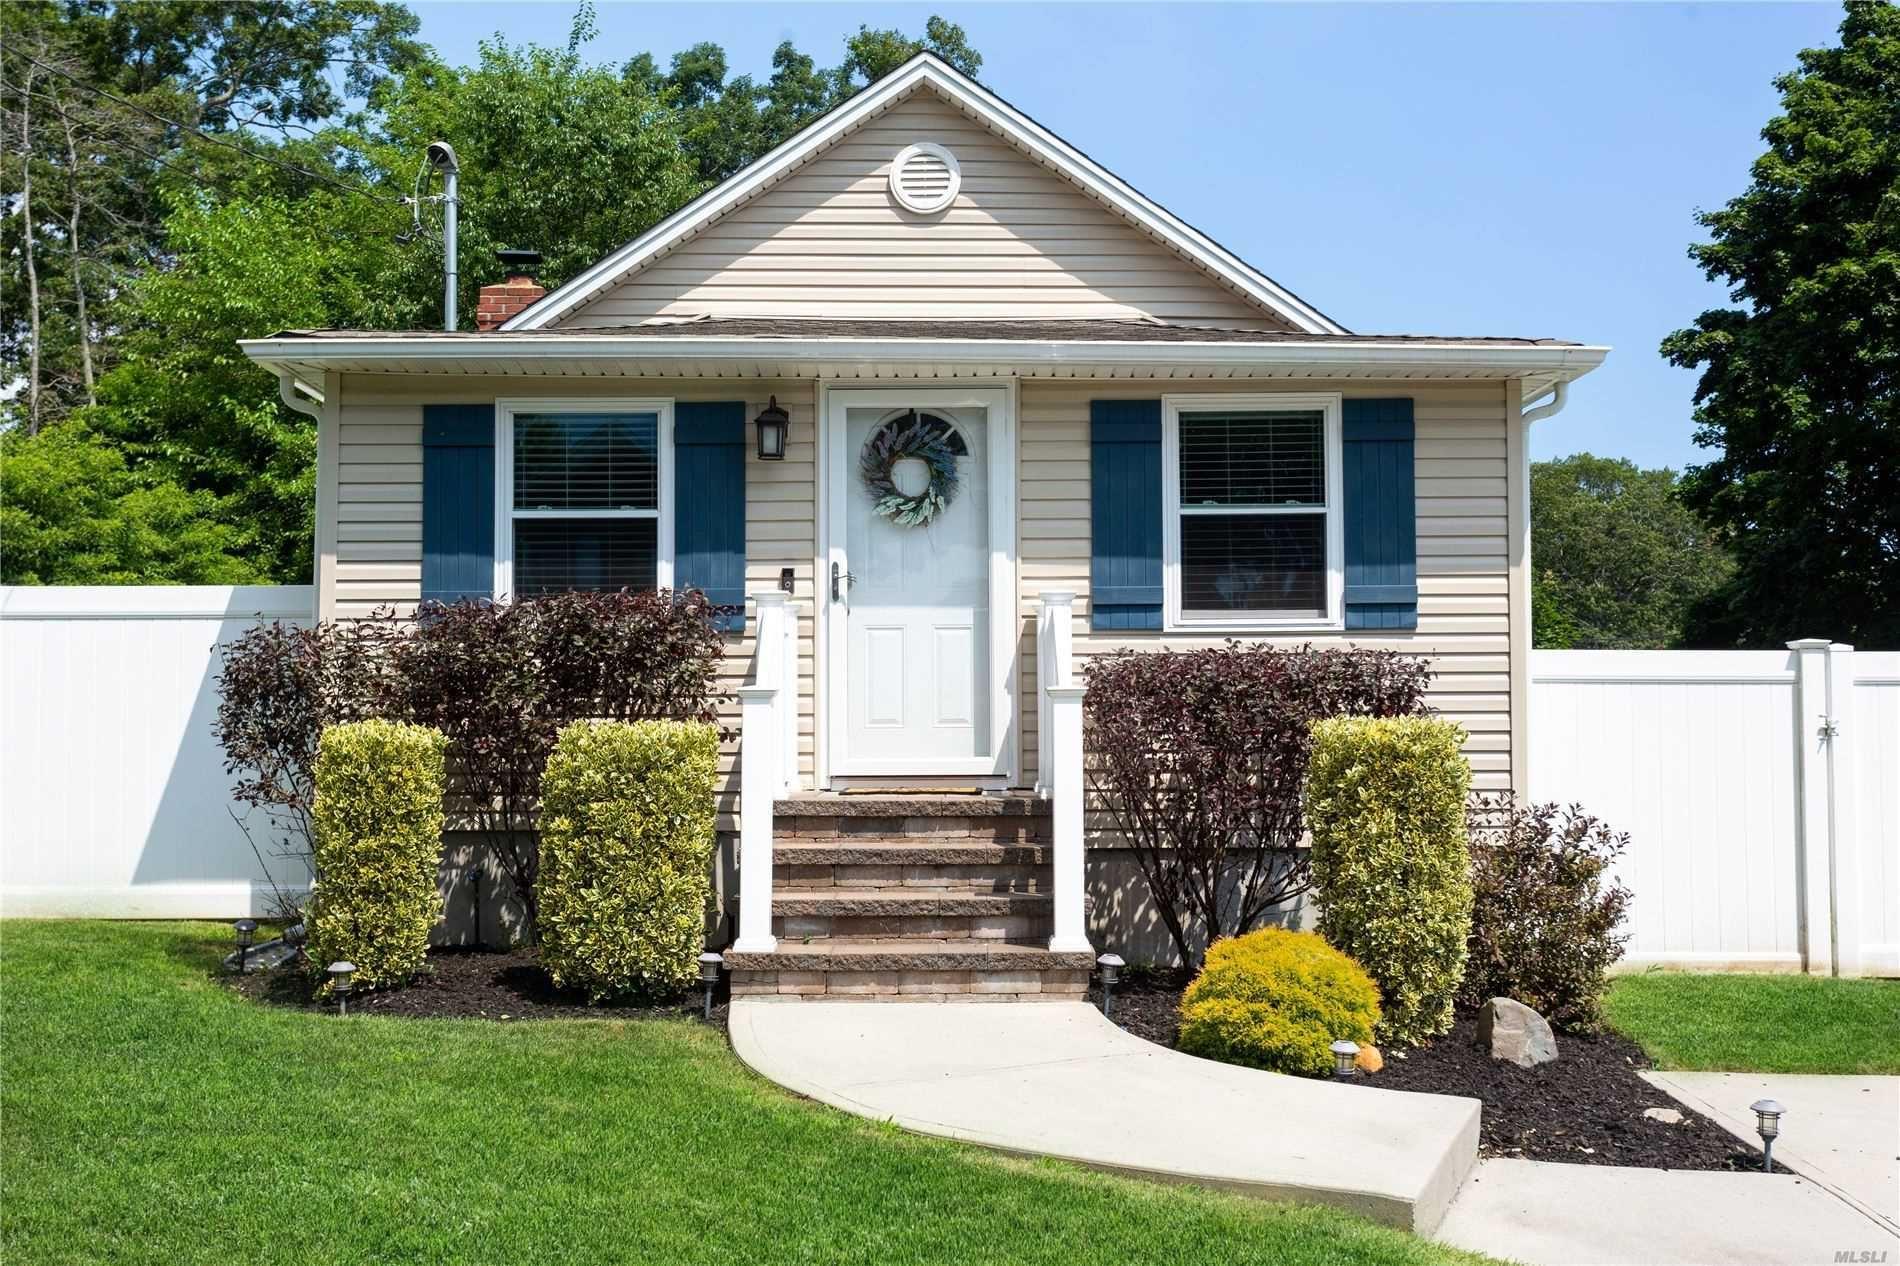 25 Woodycrest Drive, Farmingville, NY 11738 - MLS#: 3237721